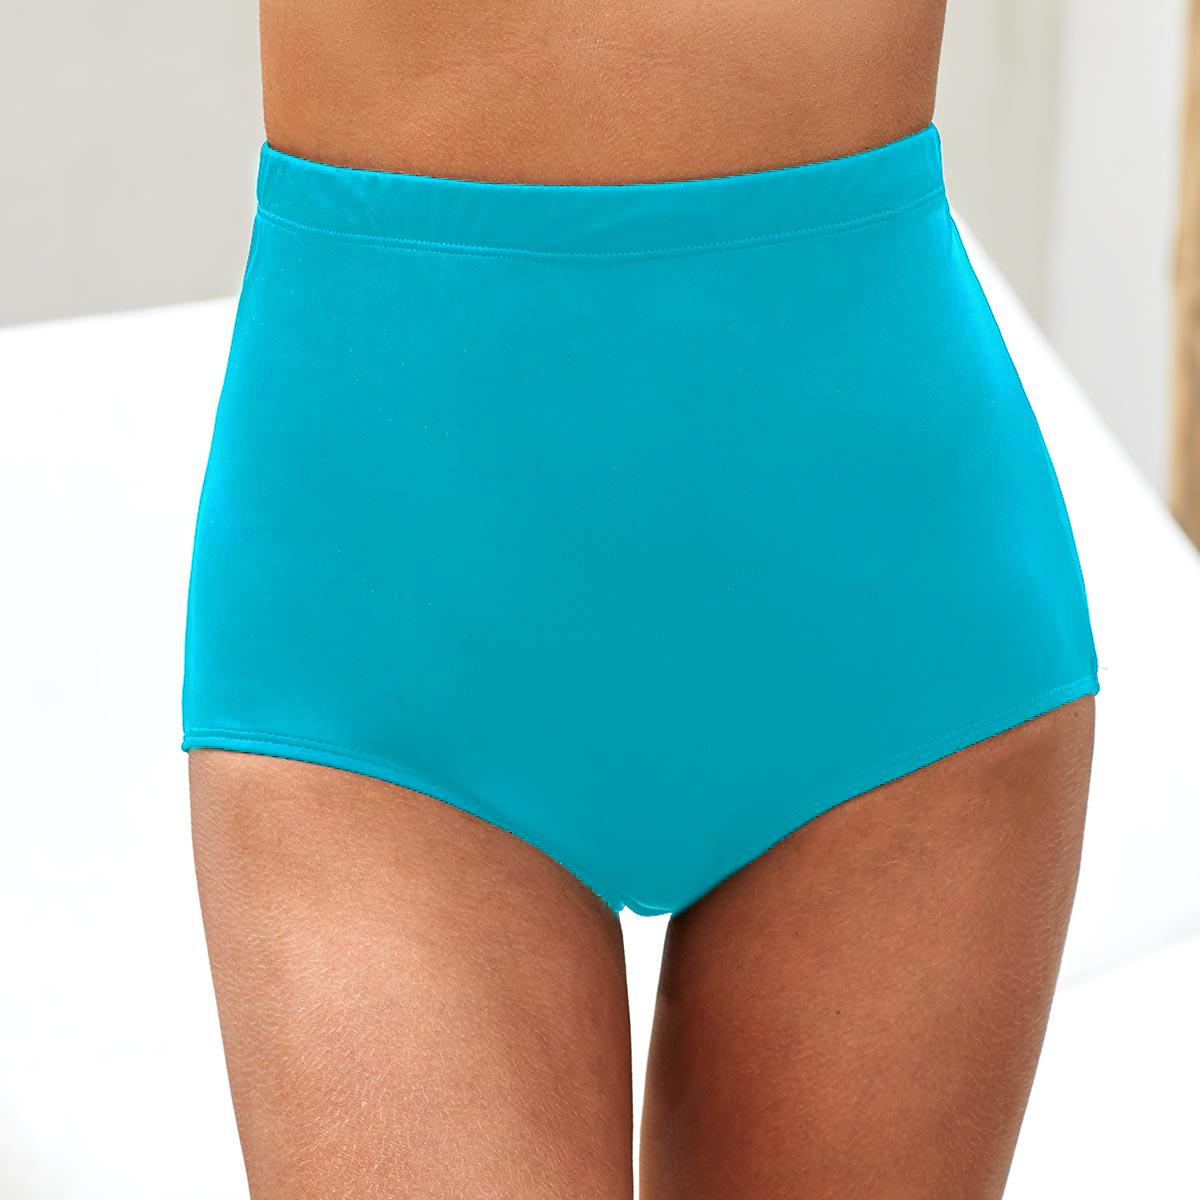 ROTITA High Waist Sky Blue Swimwear Panty